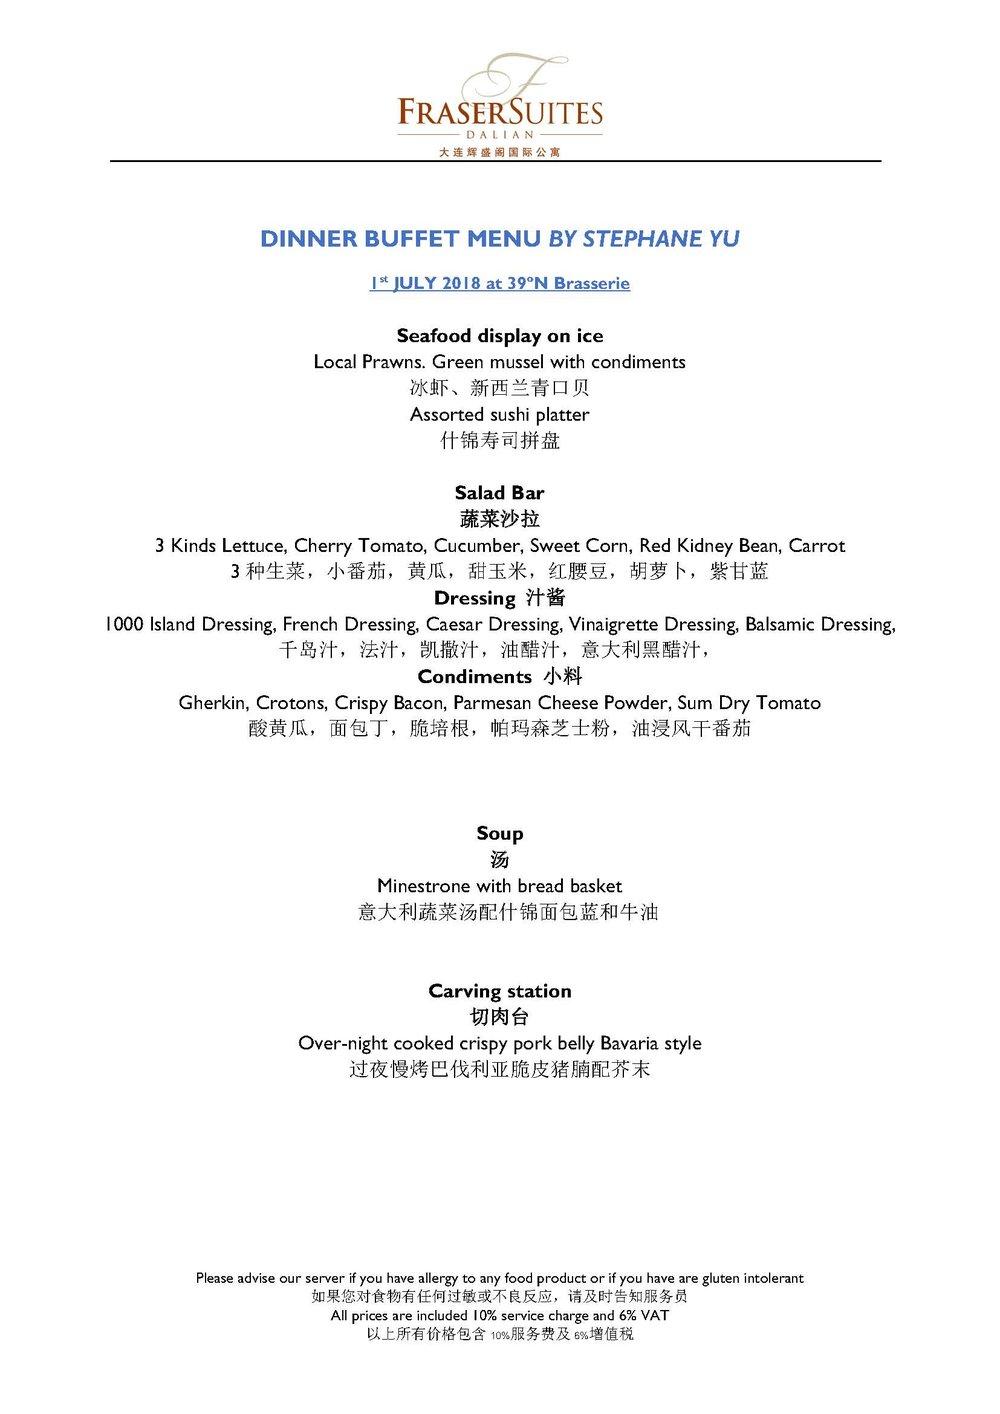 Dinner Buffet Menu 180RMB 1 JULY 2018(1)_页面_1.jpg